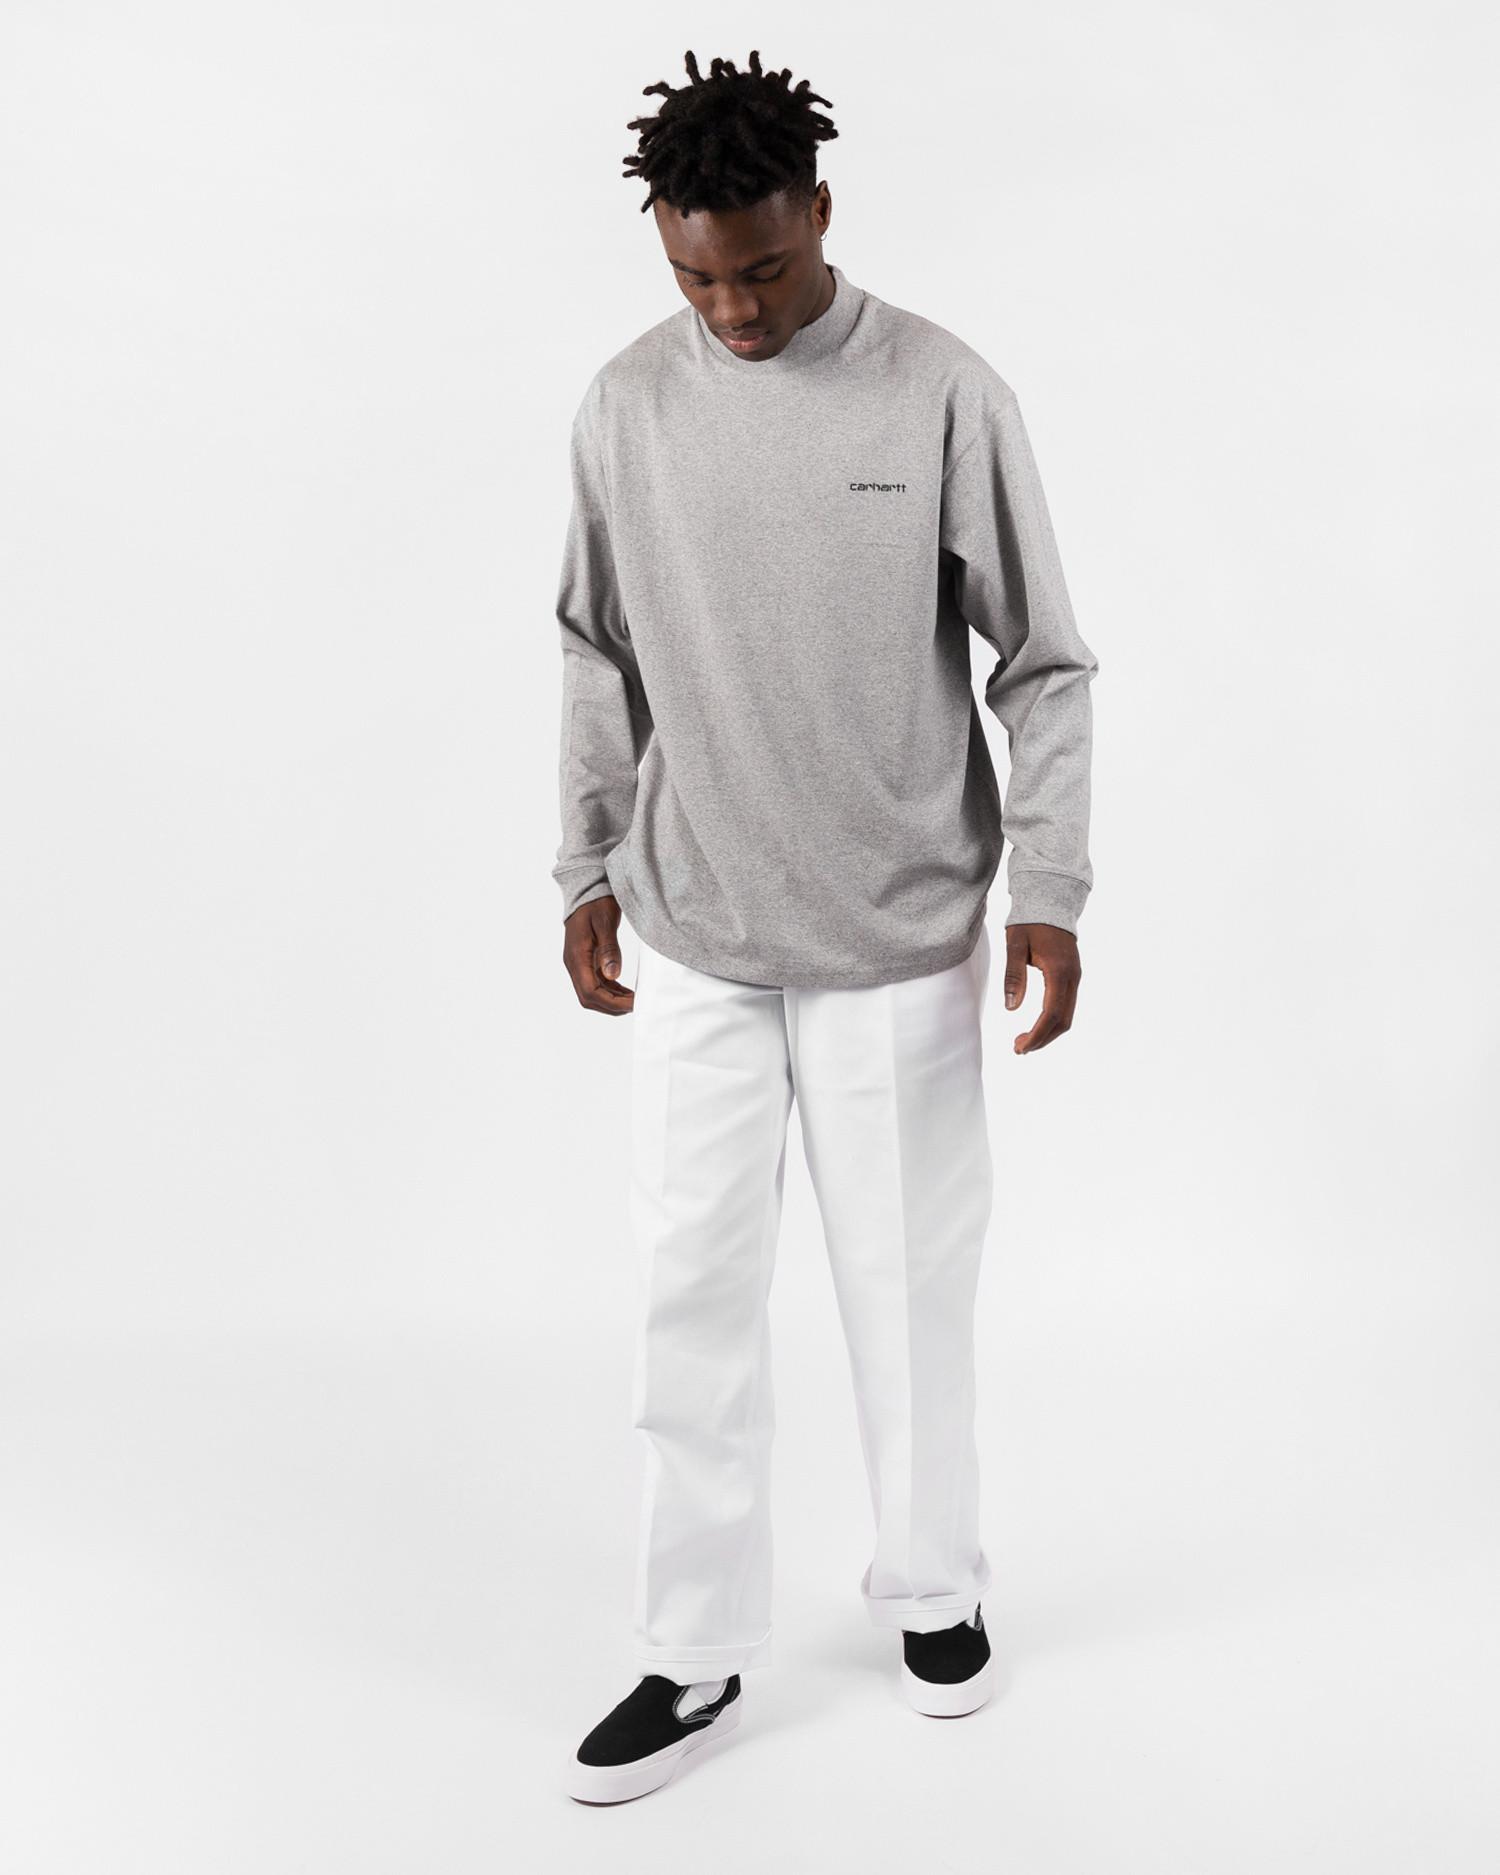 Ben Davis Original Bens Workpant White